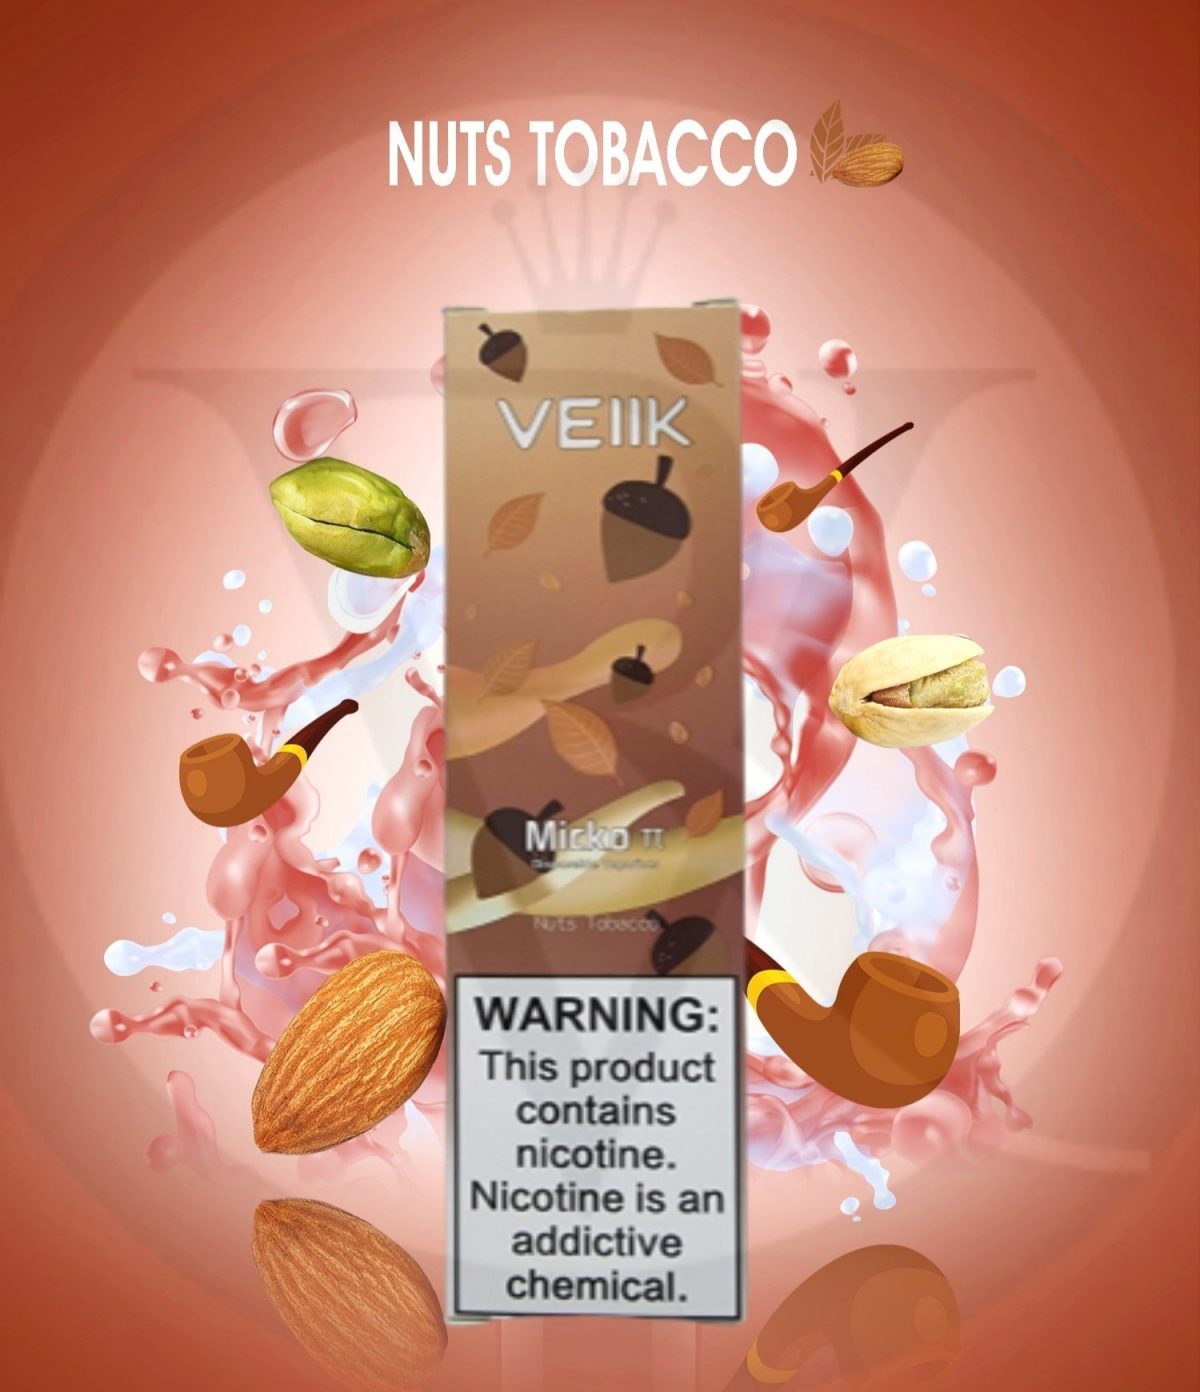 Veiik micko tt disposable nuts tobacco